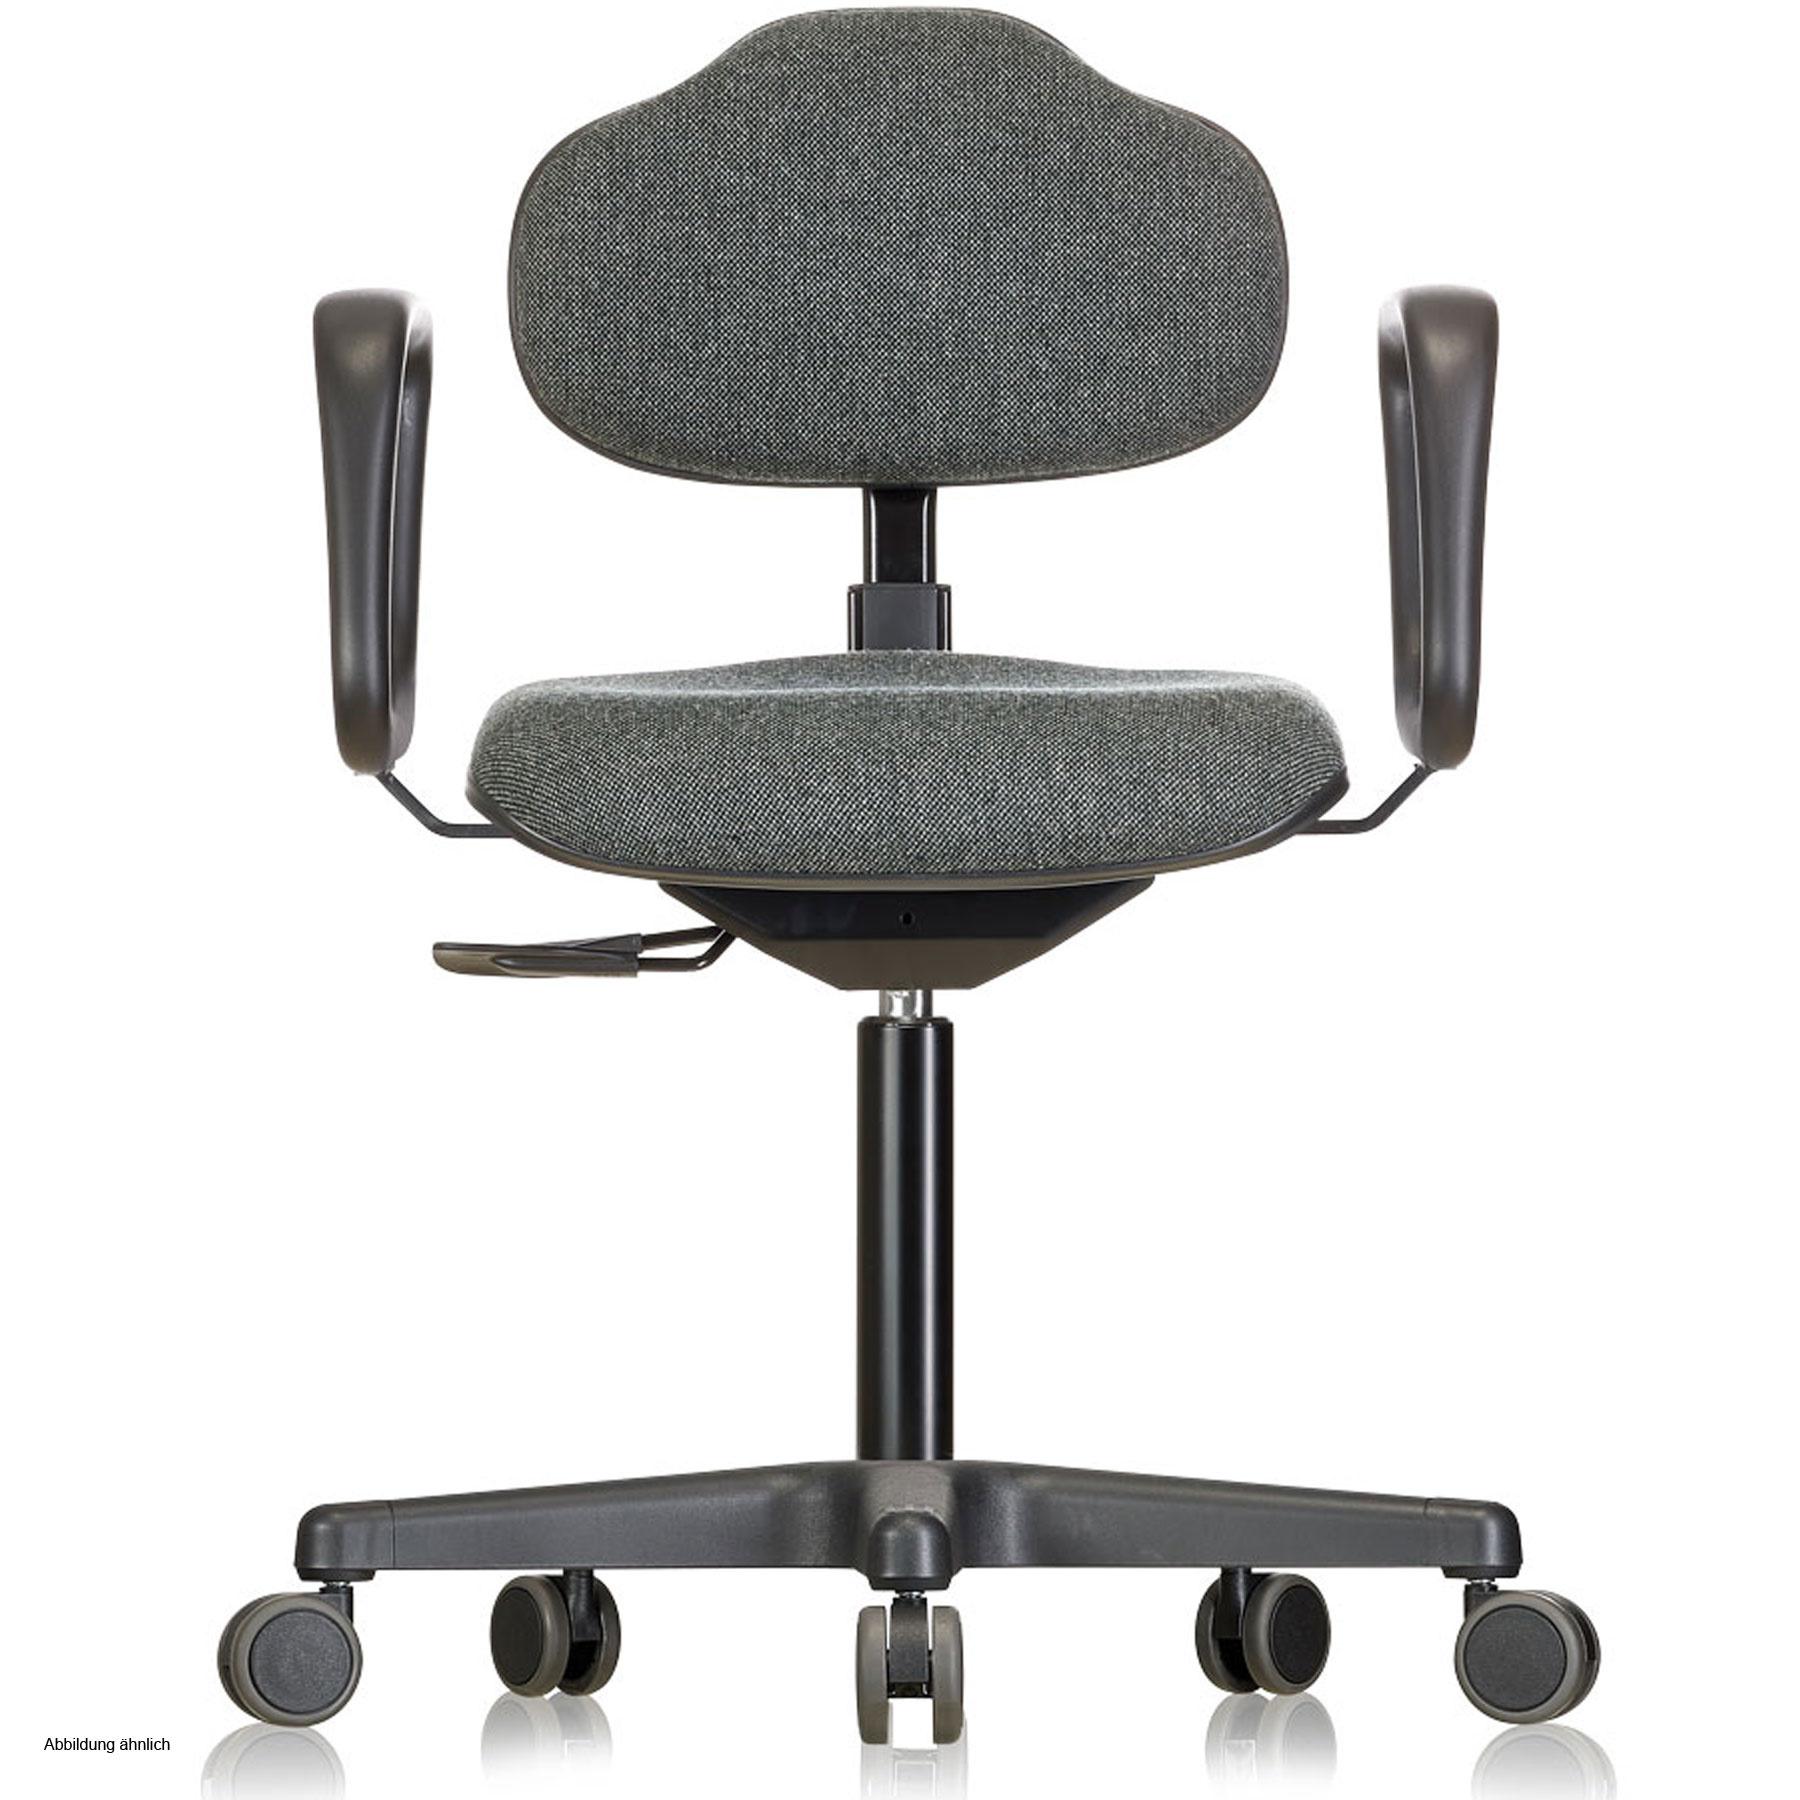 Werksitz Econoline Ws 2320 Swivel Chairs 269 90